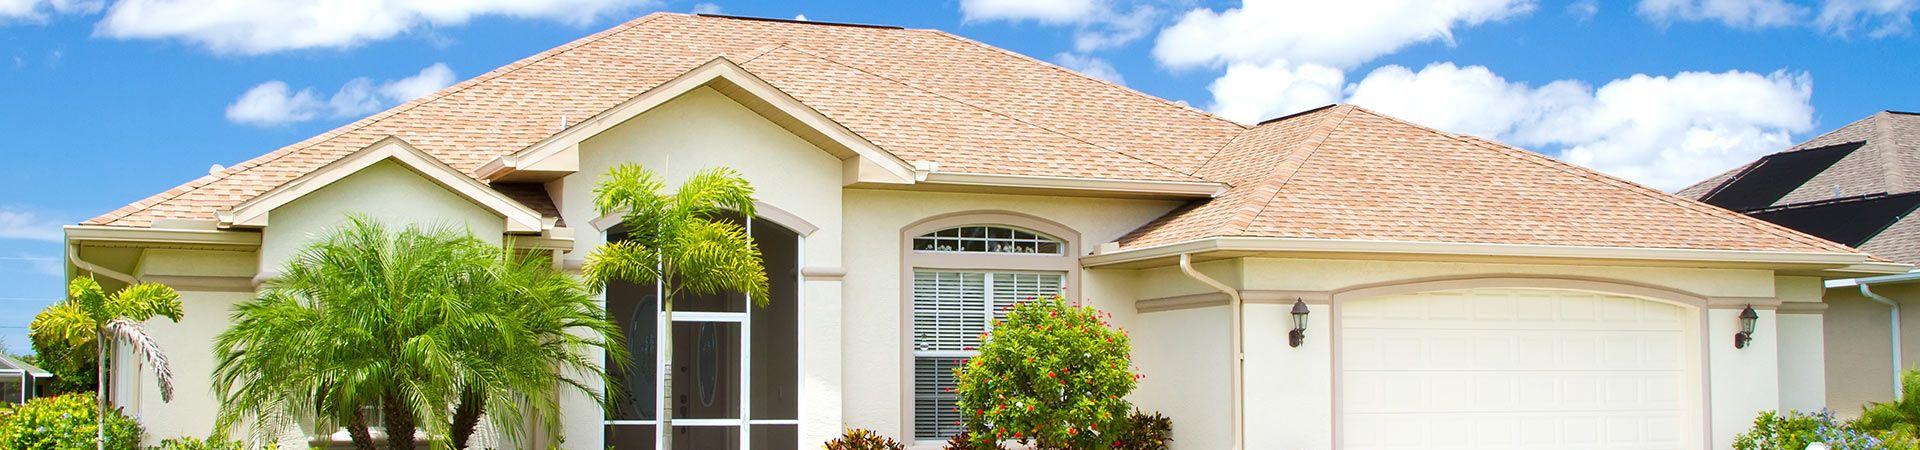 Florida Homeowner Insurance